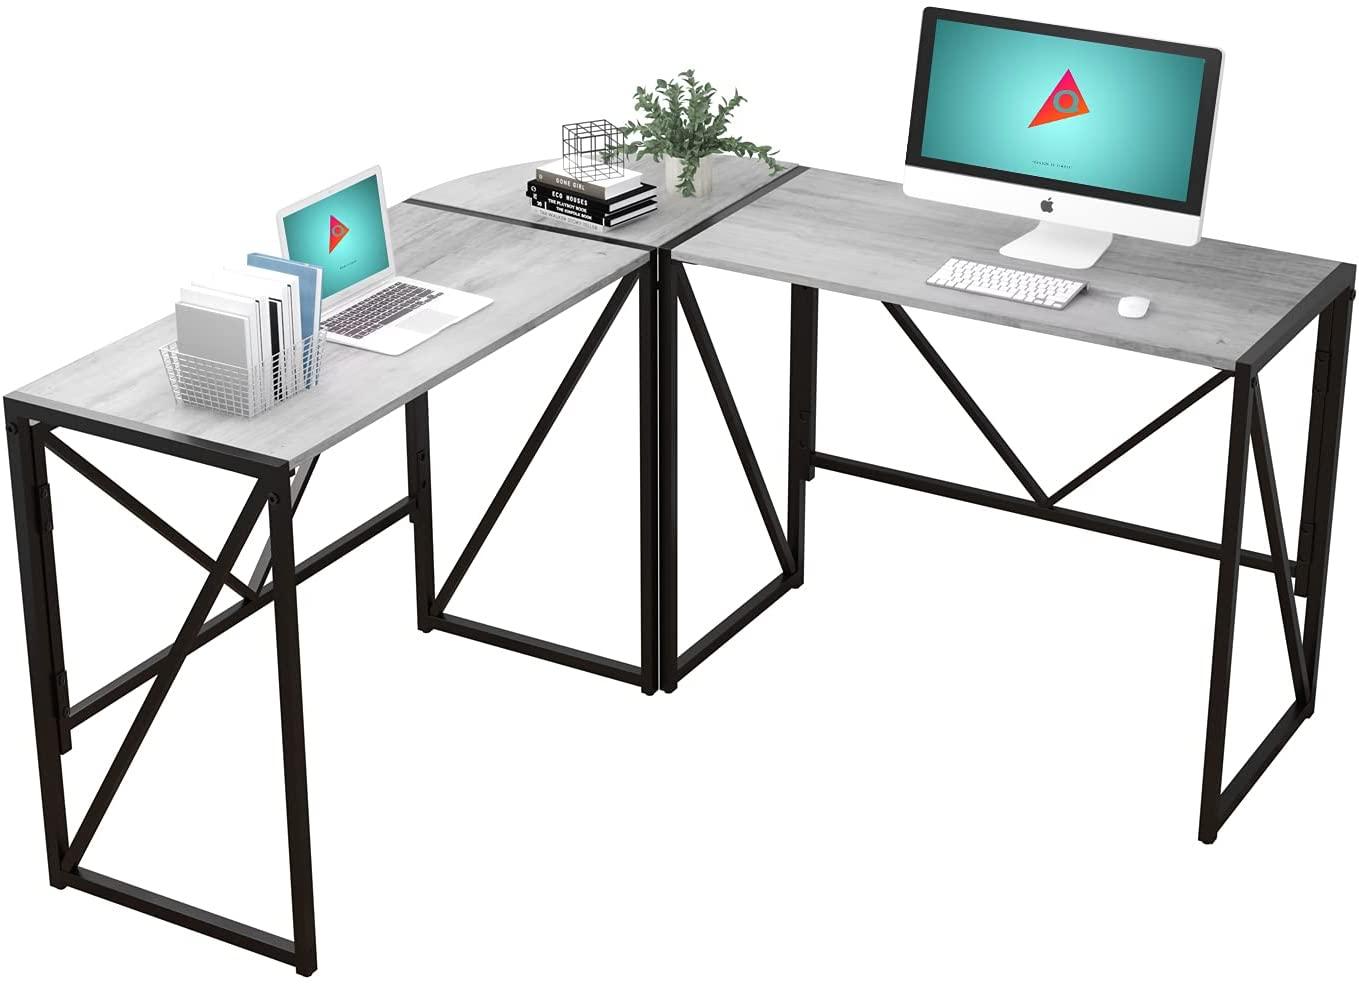 QEEIG Foldable Grey L-shaped Gaming Desk